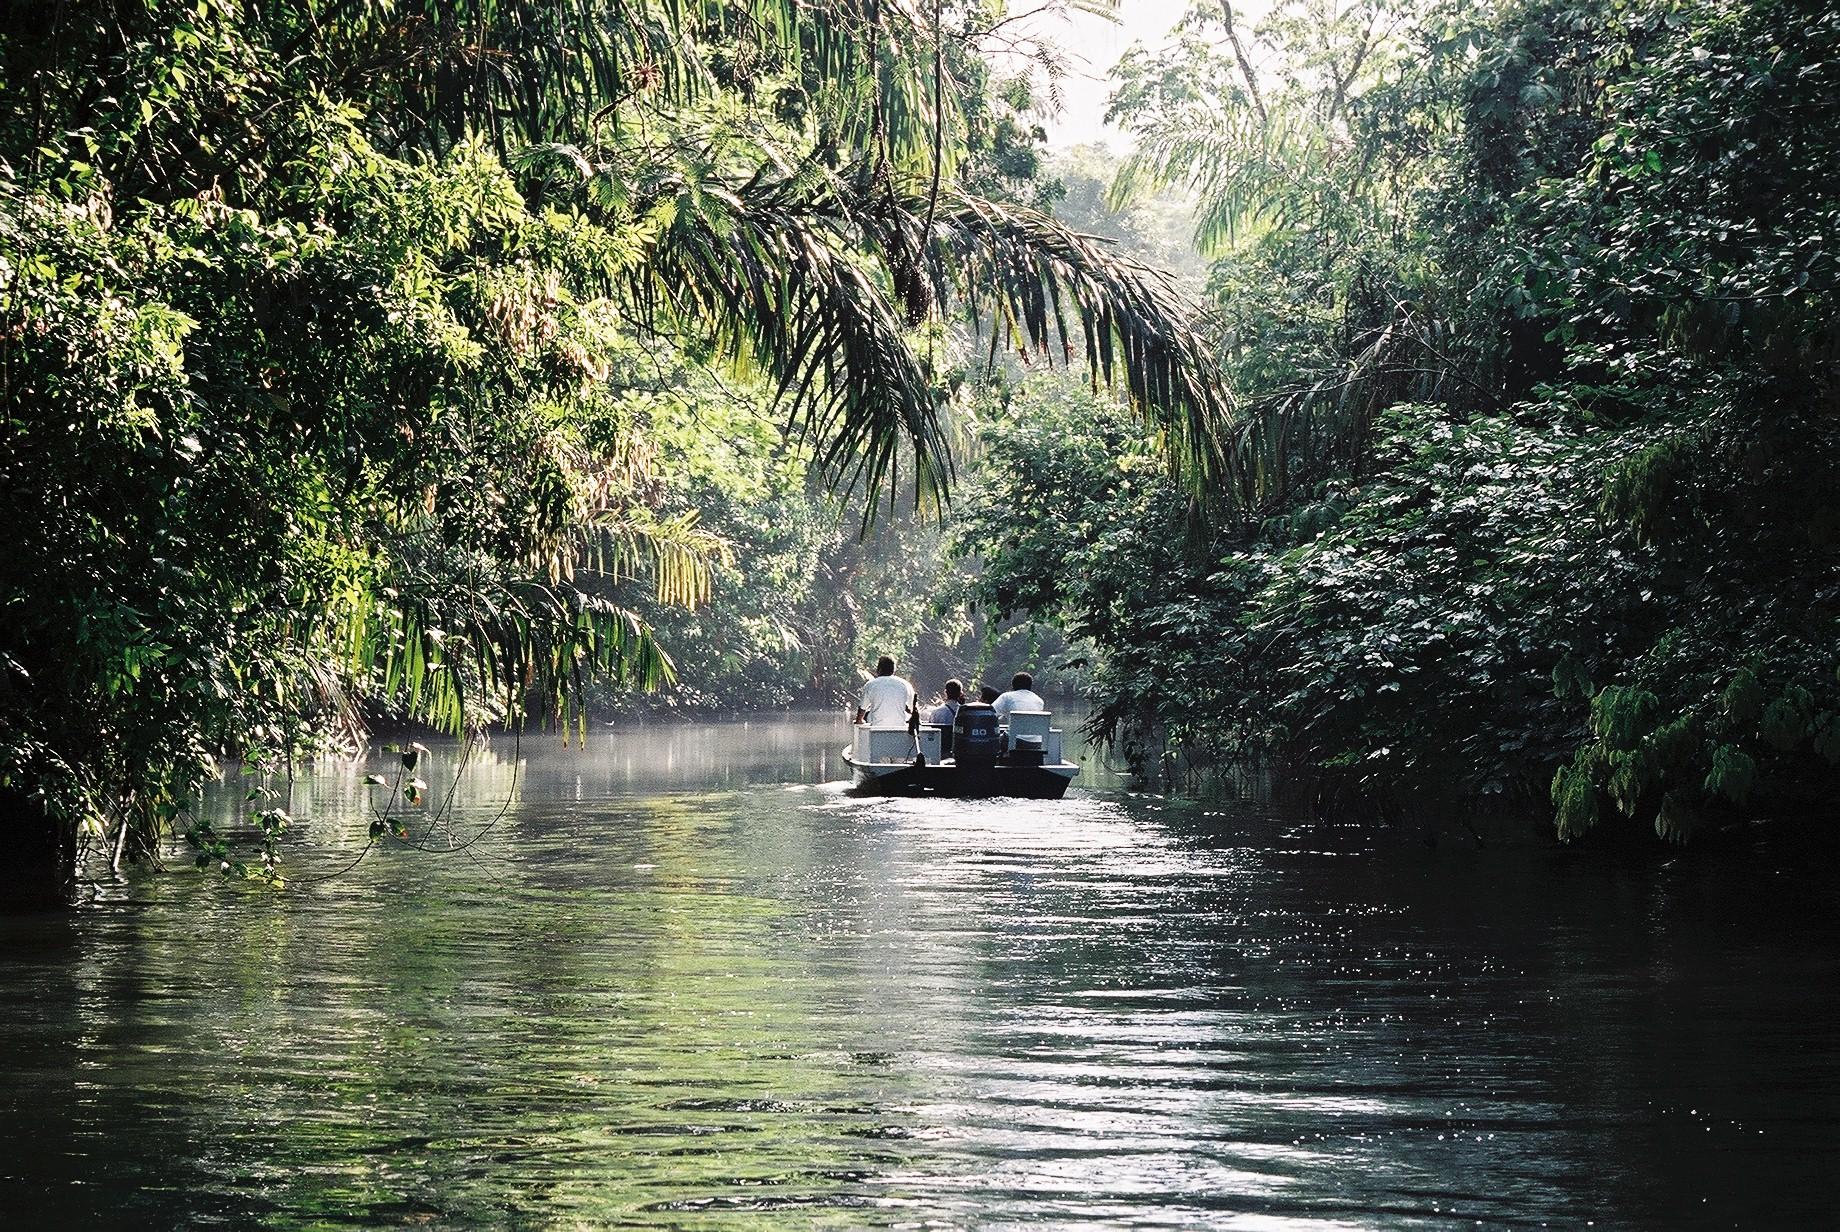 File:Tortuguero boat trip.JPG - Wikimedia Commons